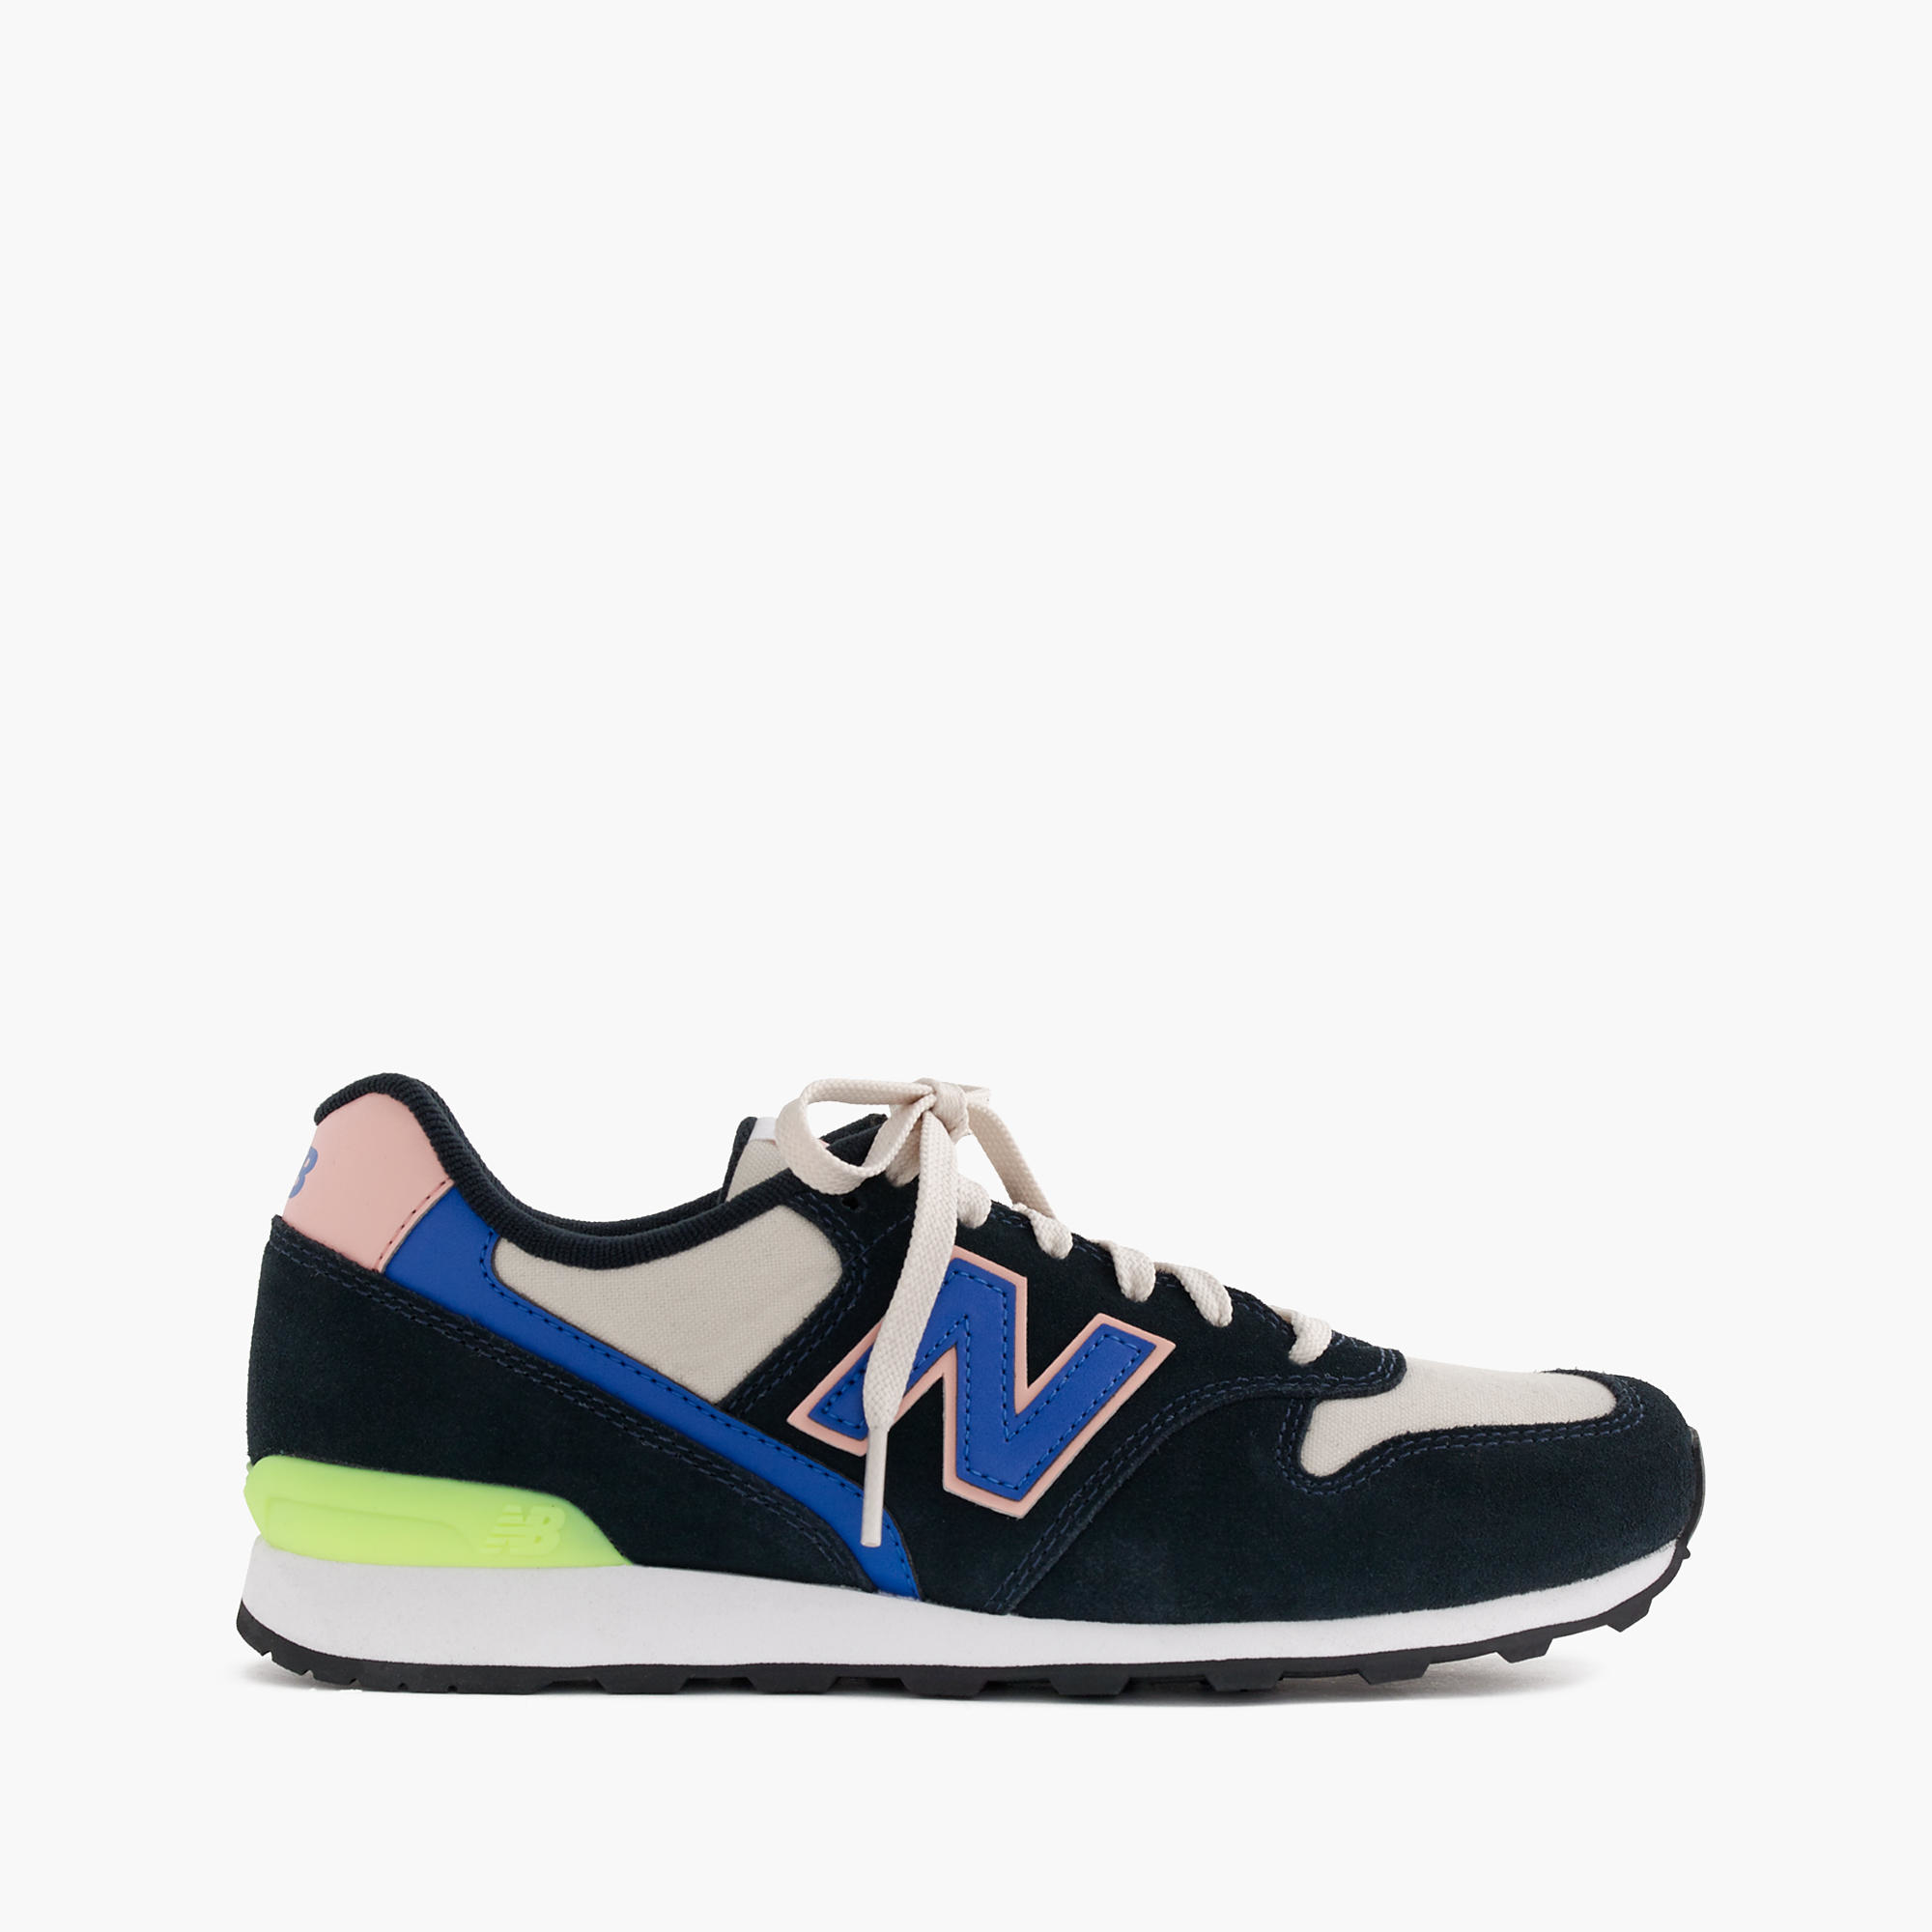 new balance 696 navy